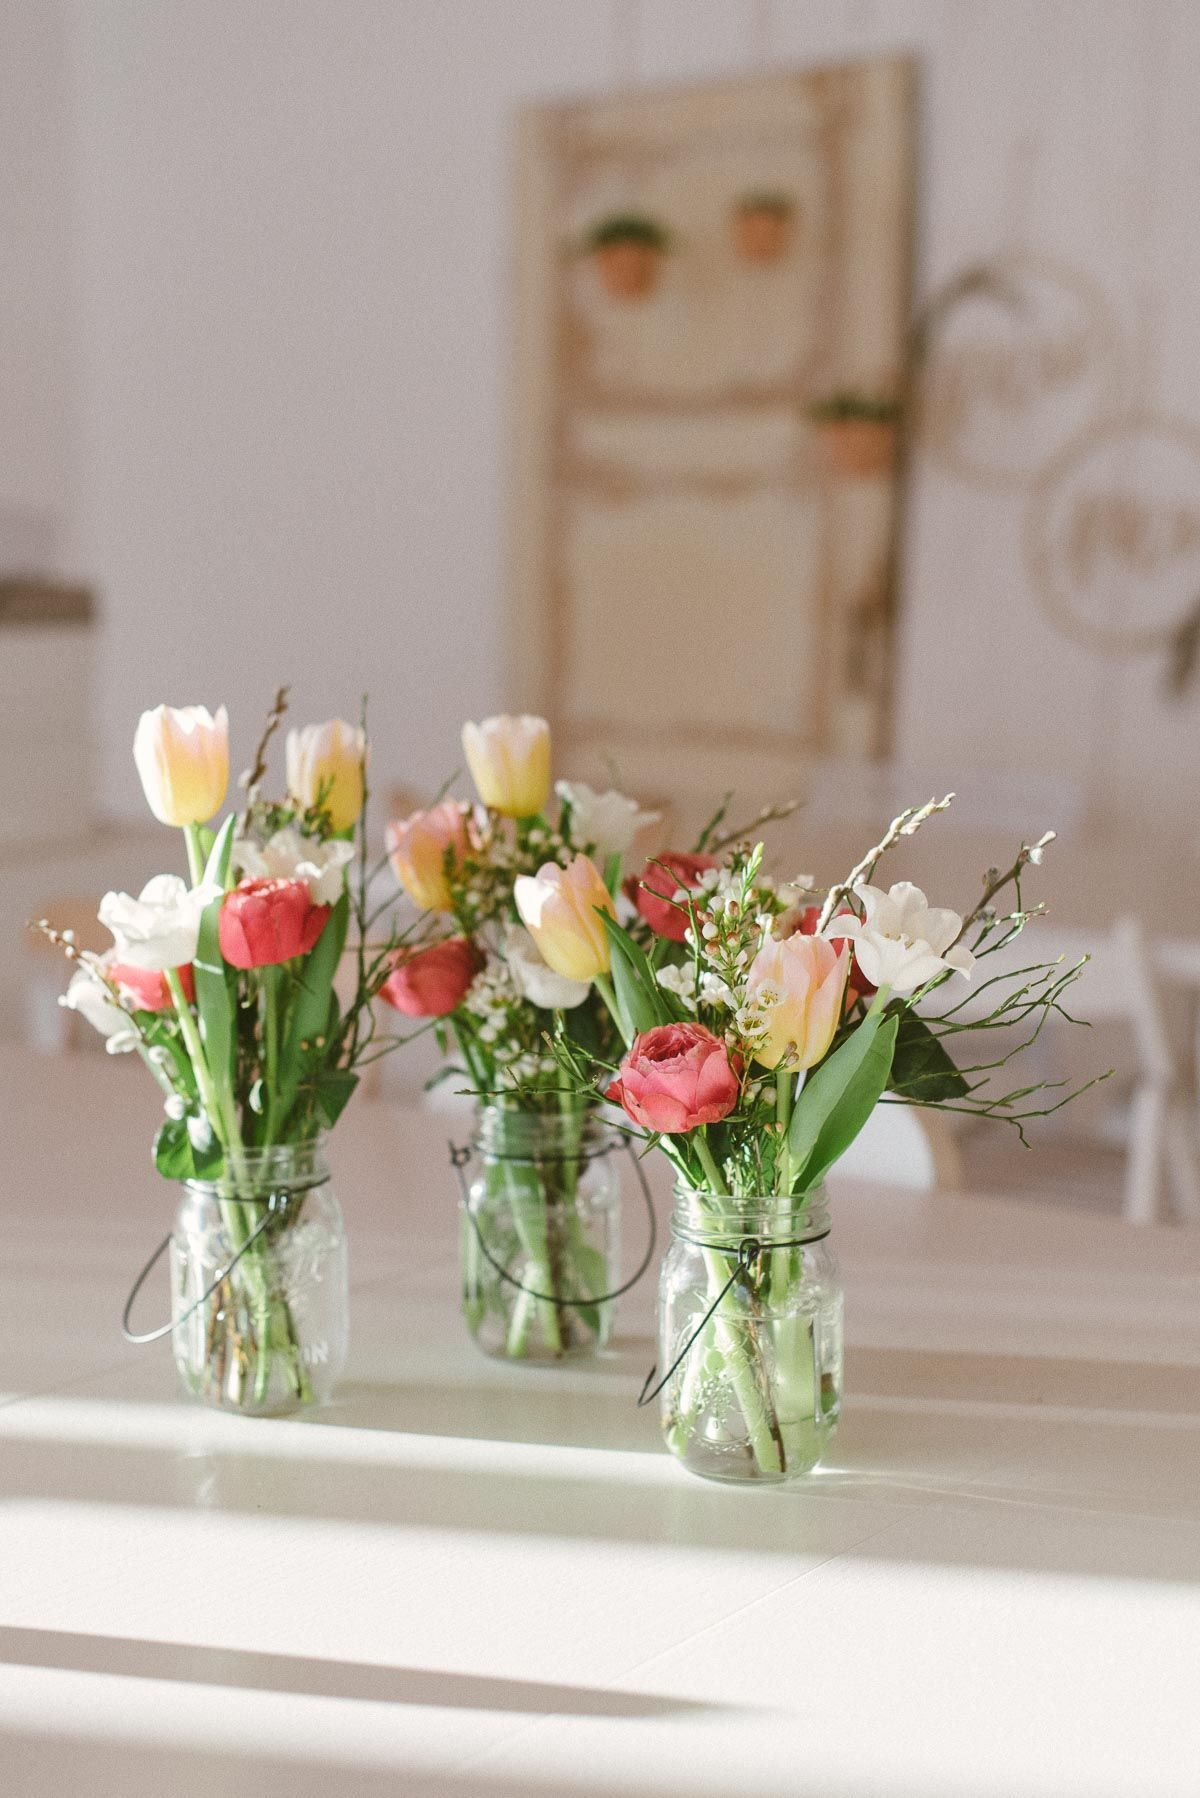 Flower Friday: Kleiner Frühlingsstrauß mit Tulpen – Fräulein K. Sagt Ja – Boda fotos